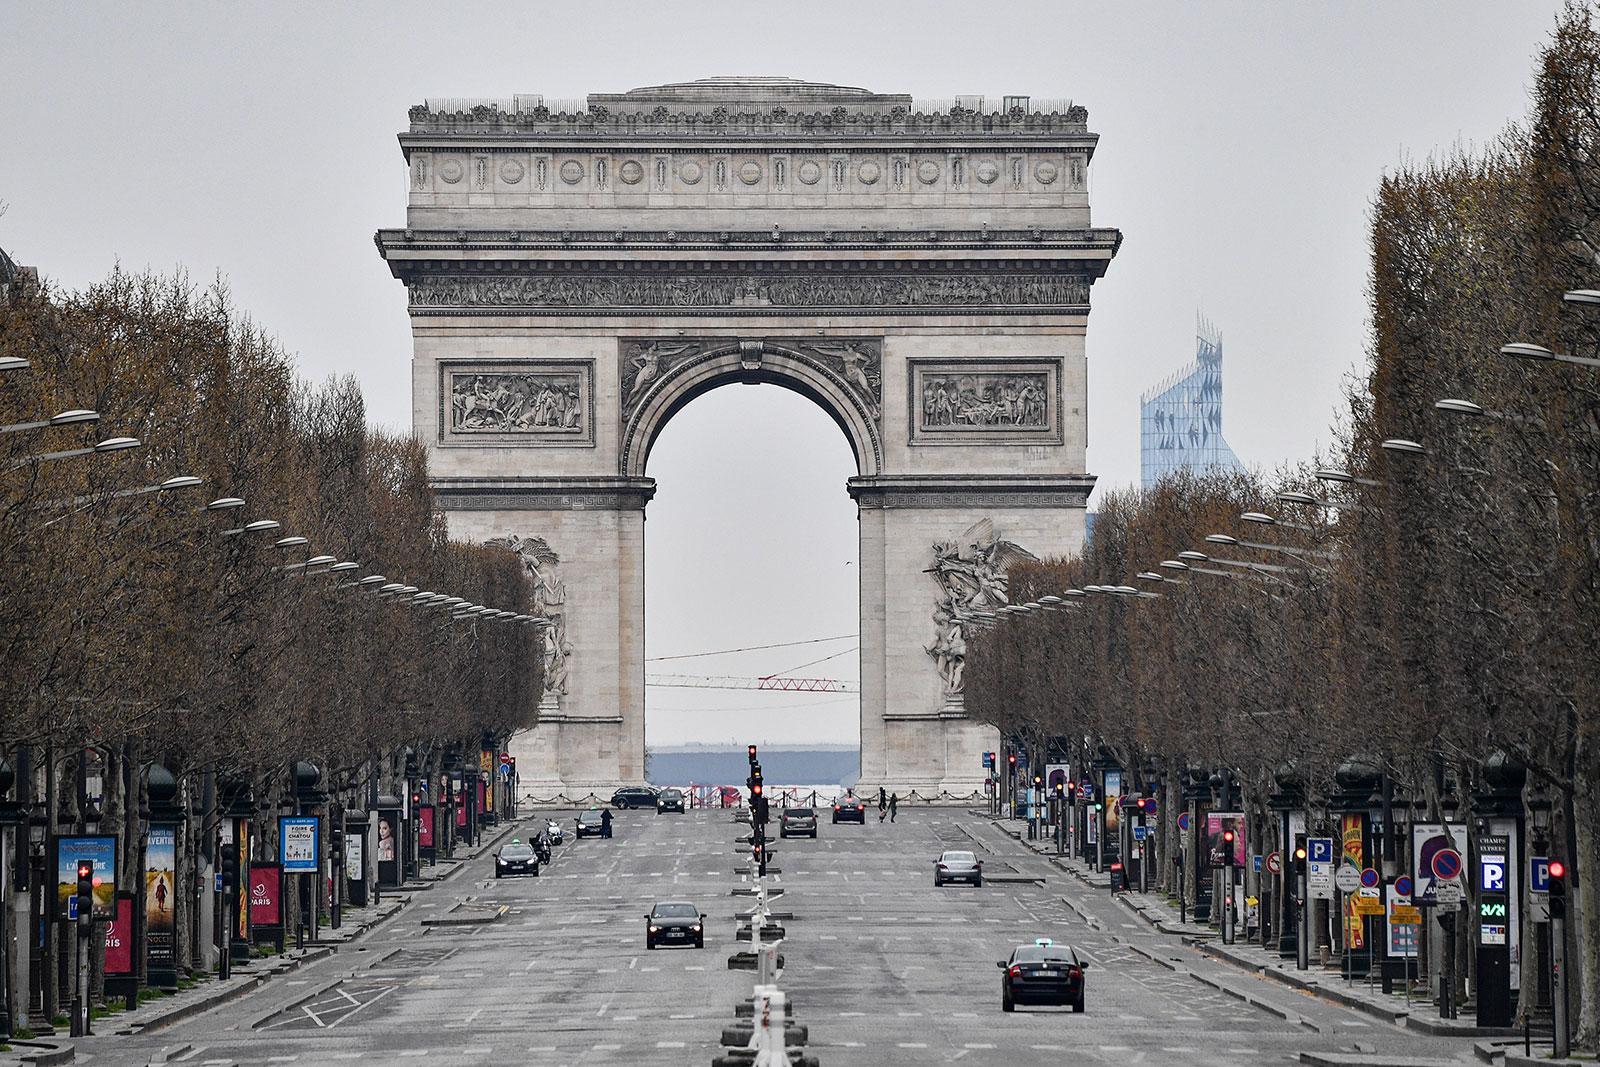 Julien Mattia/Anadolu Agency/Getty Images